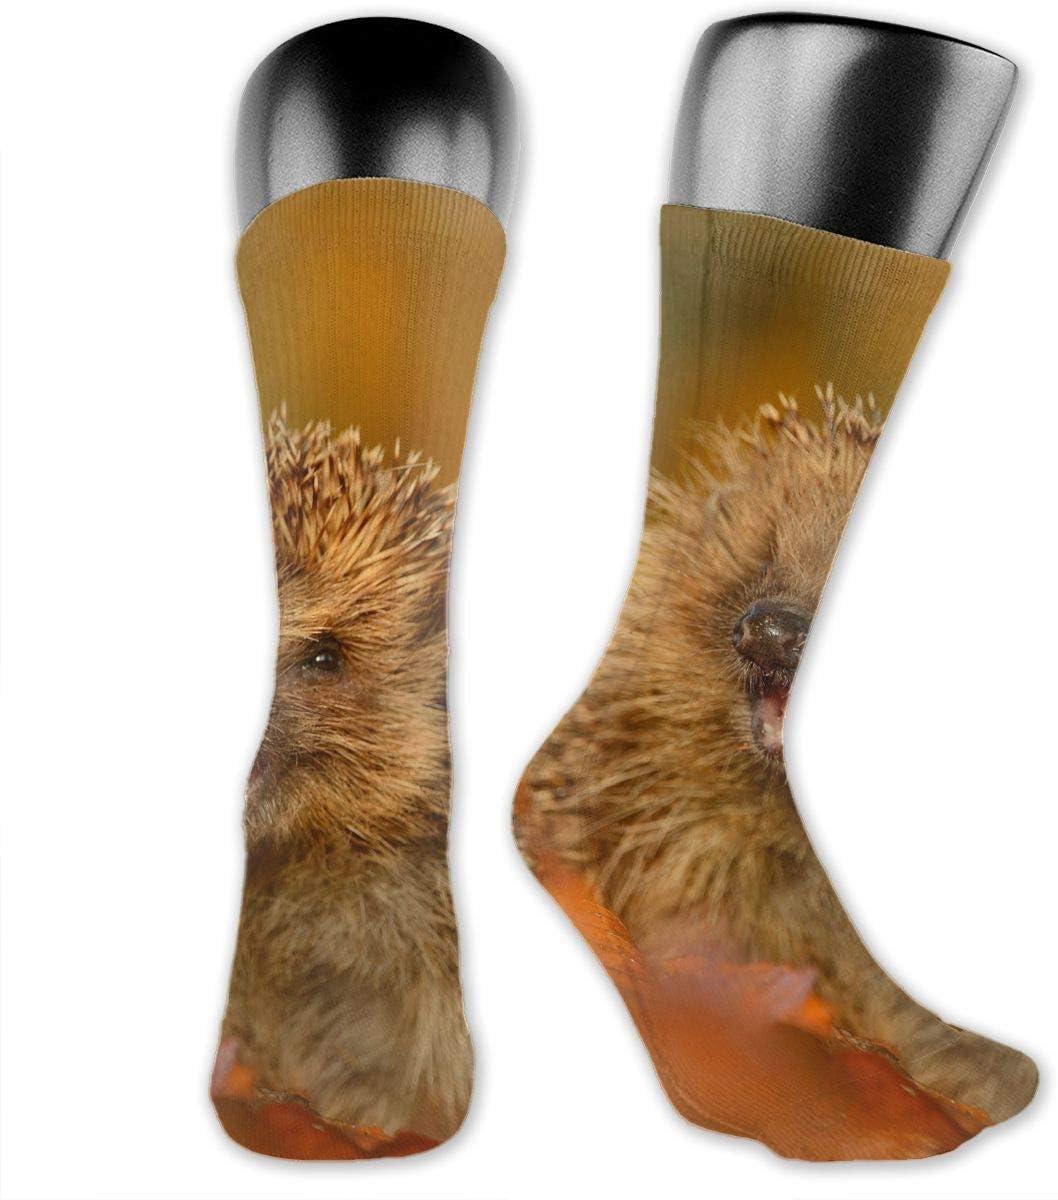 OLGCZM Pomeranian Dog Pattern Men Womens Thin High Ankle Casual Socks Fit Outdoor Hiking Trail